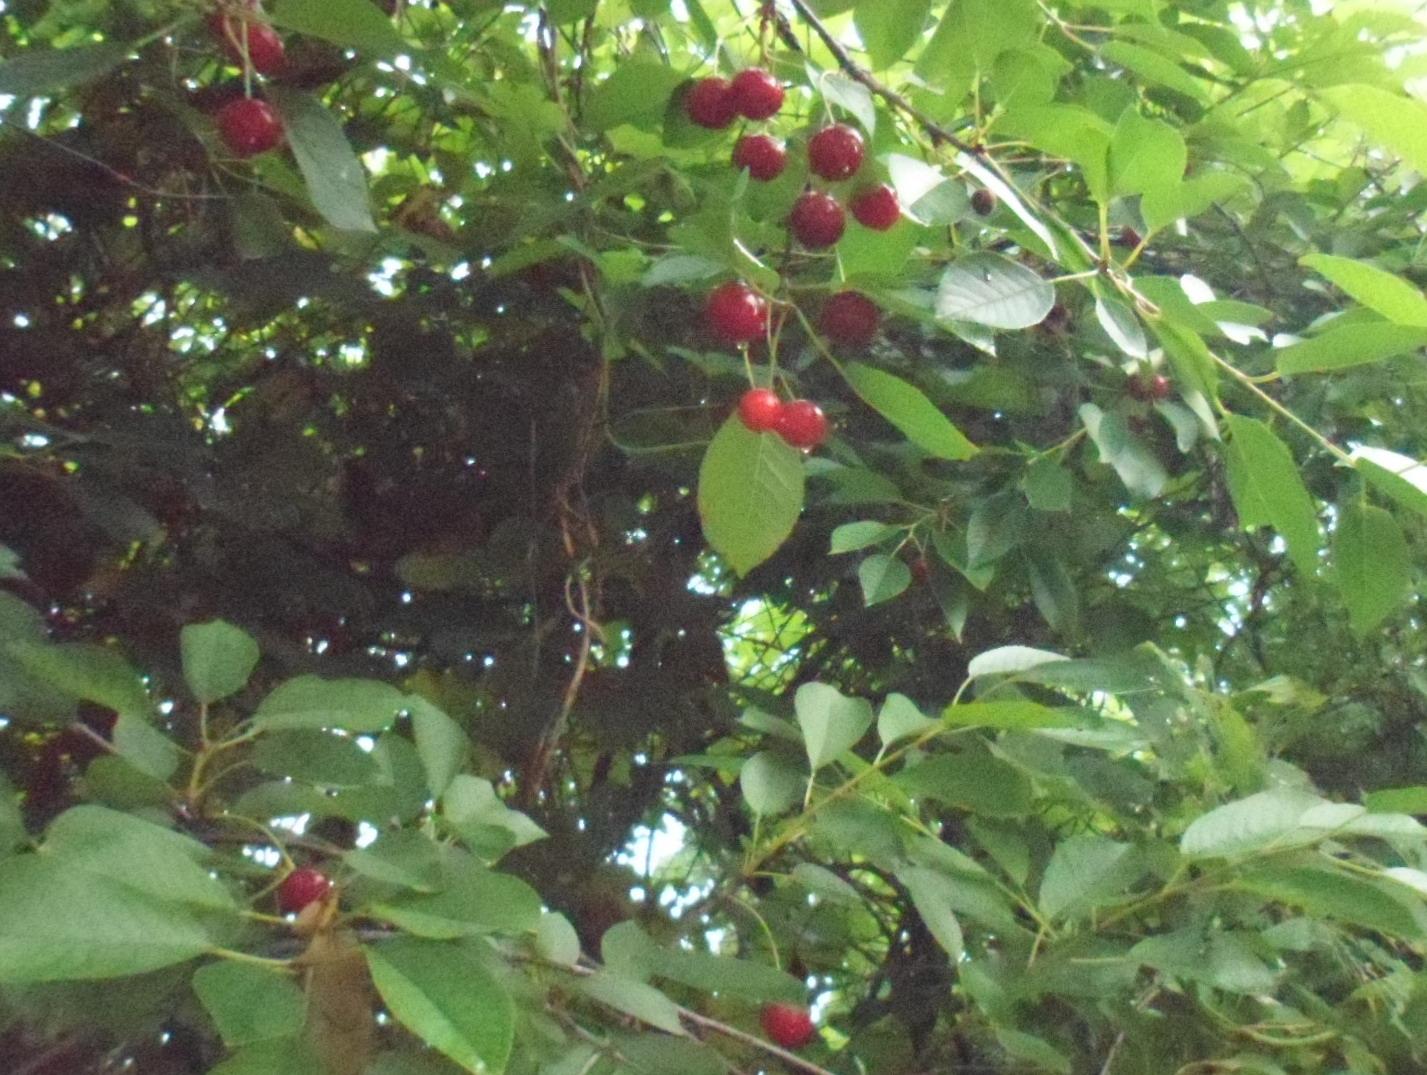 Сливо-вишнёвый гибрид, или вишнеслива — Сады Сибири